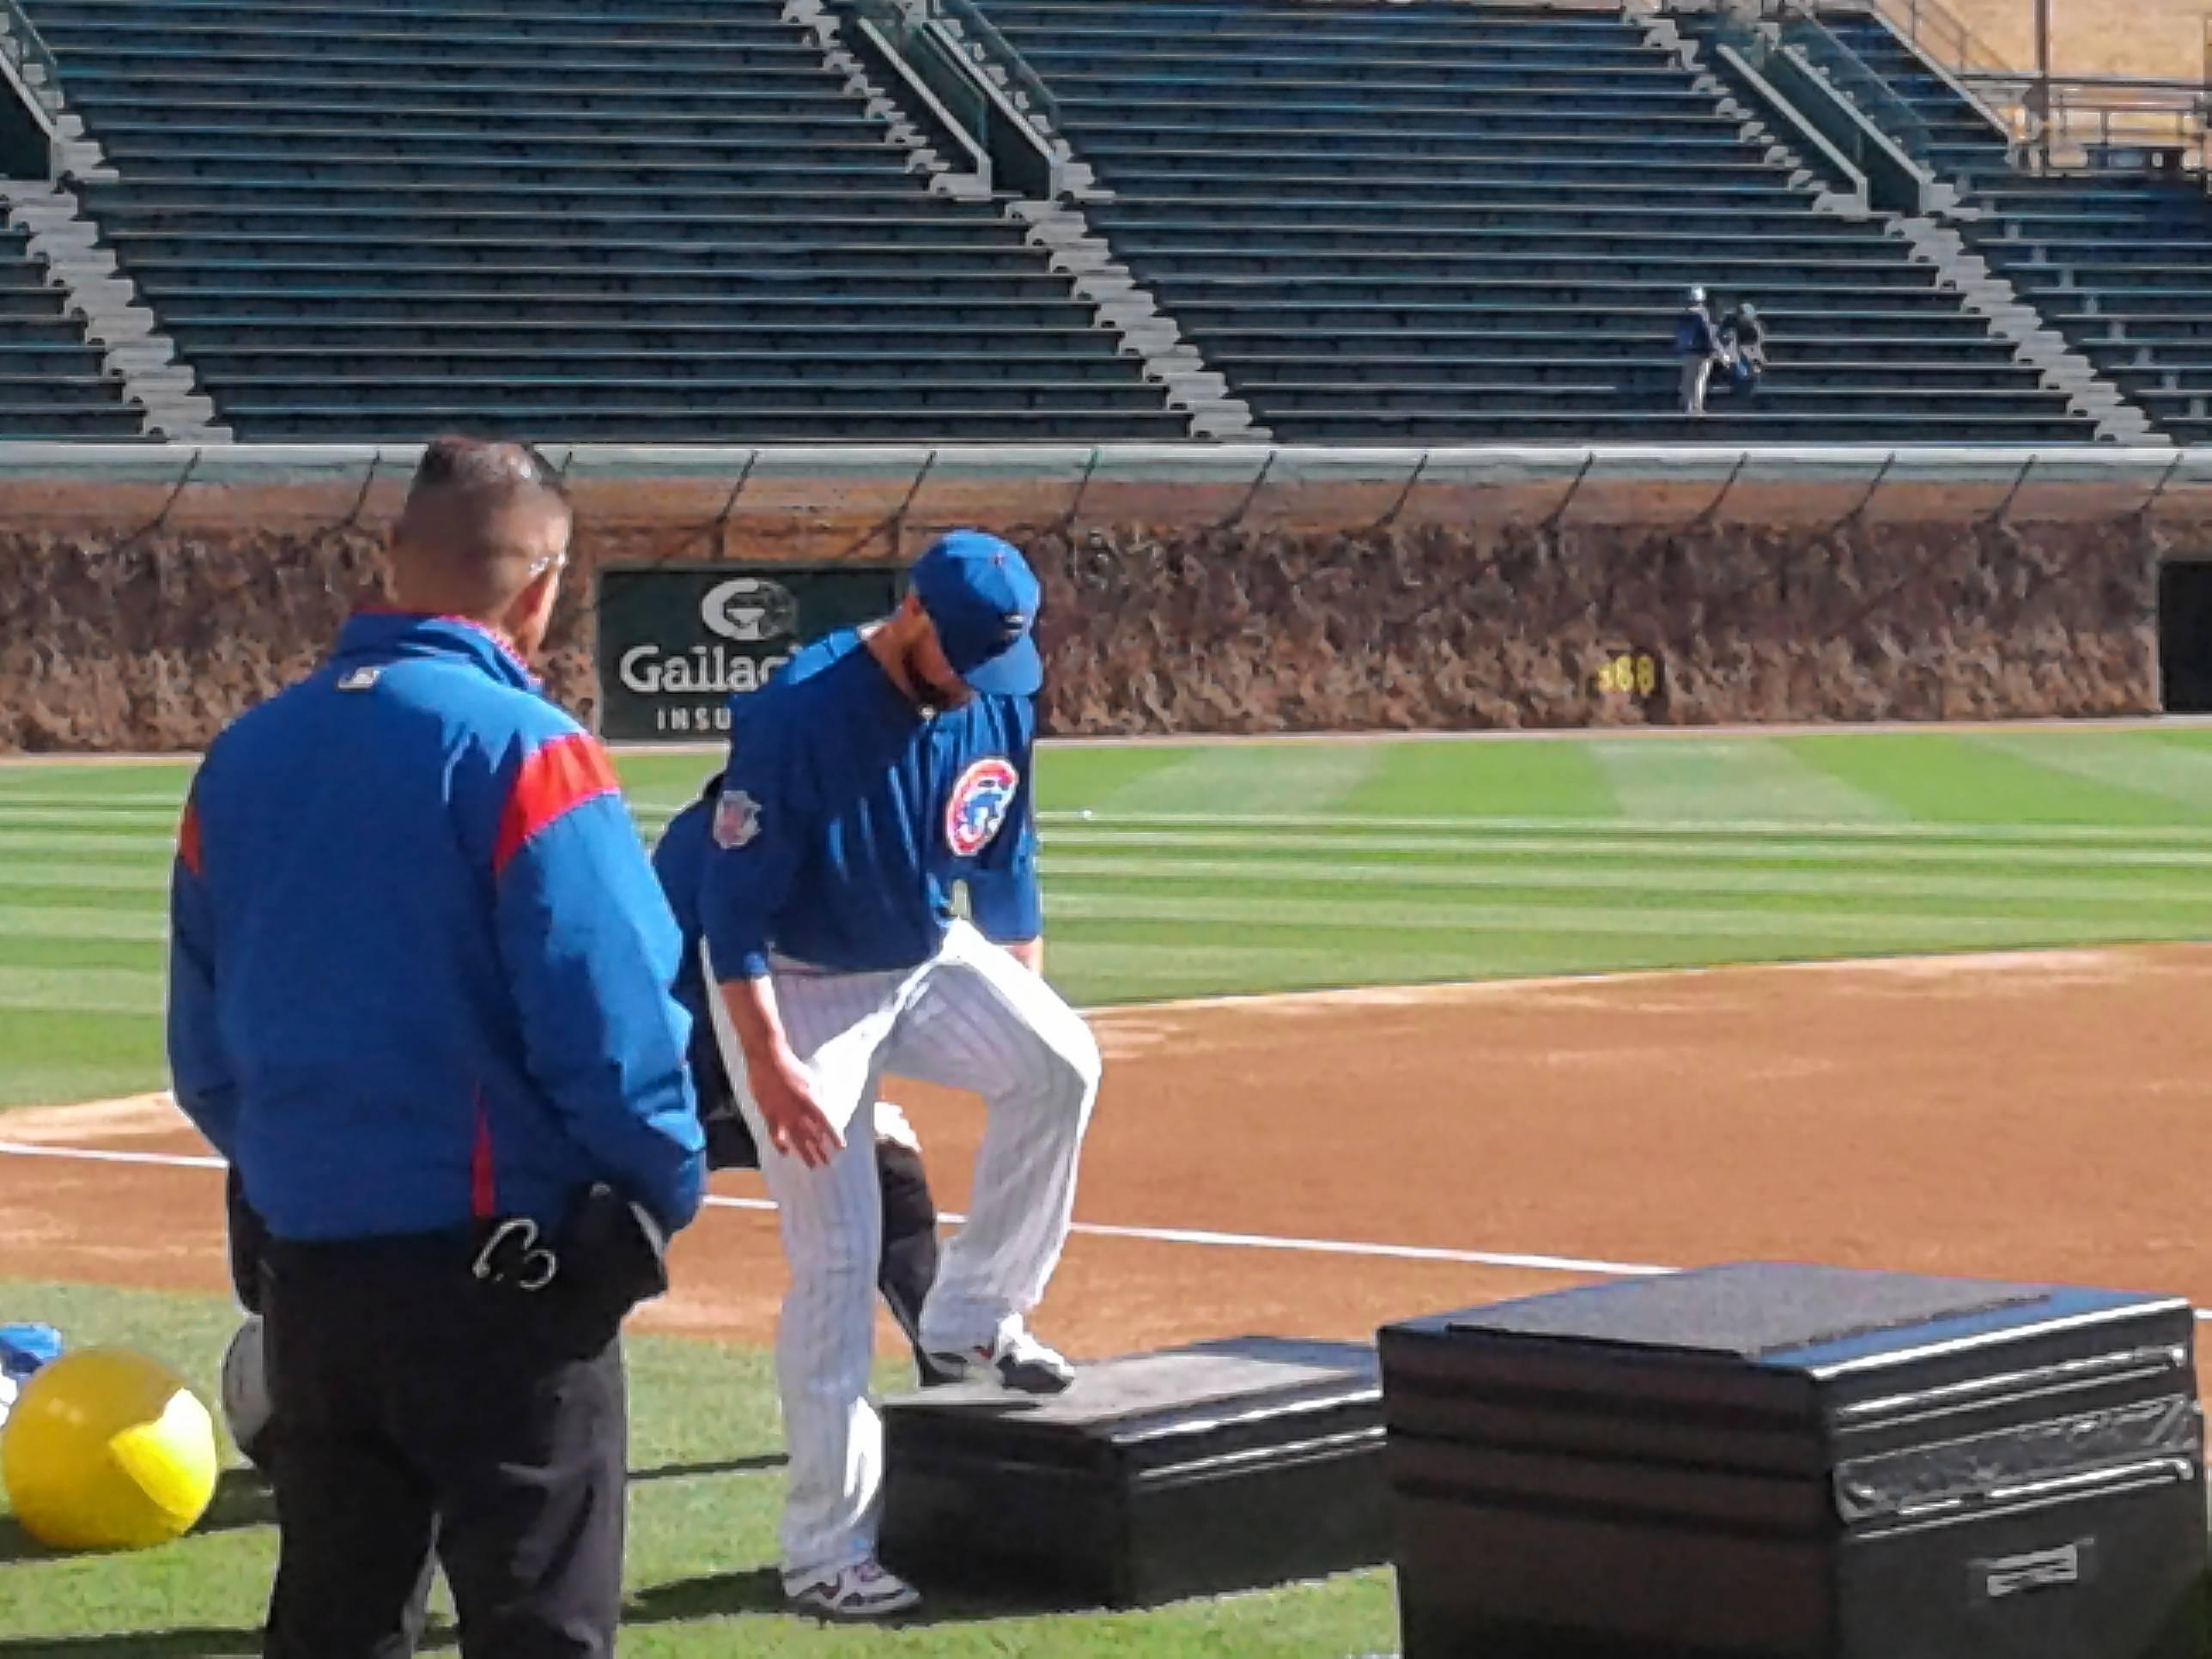 Cubs get good news on Lester, bad news on Morrow